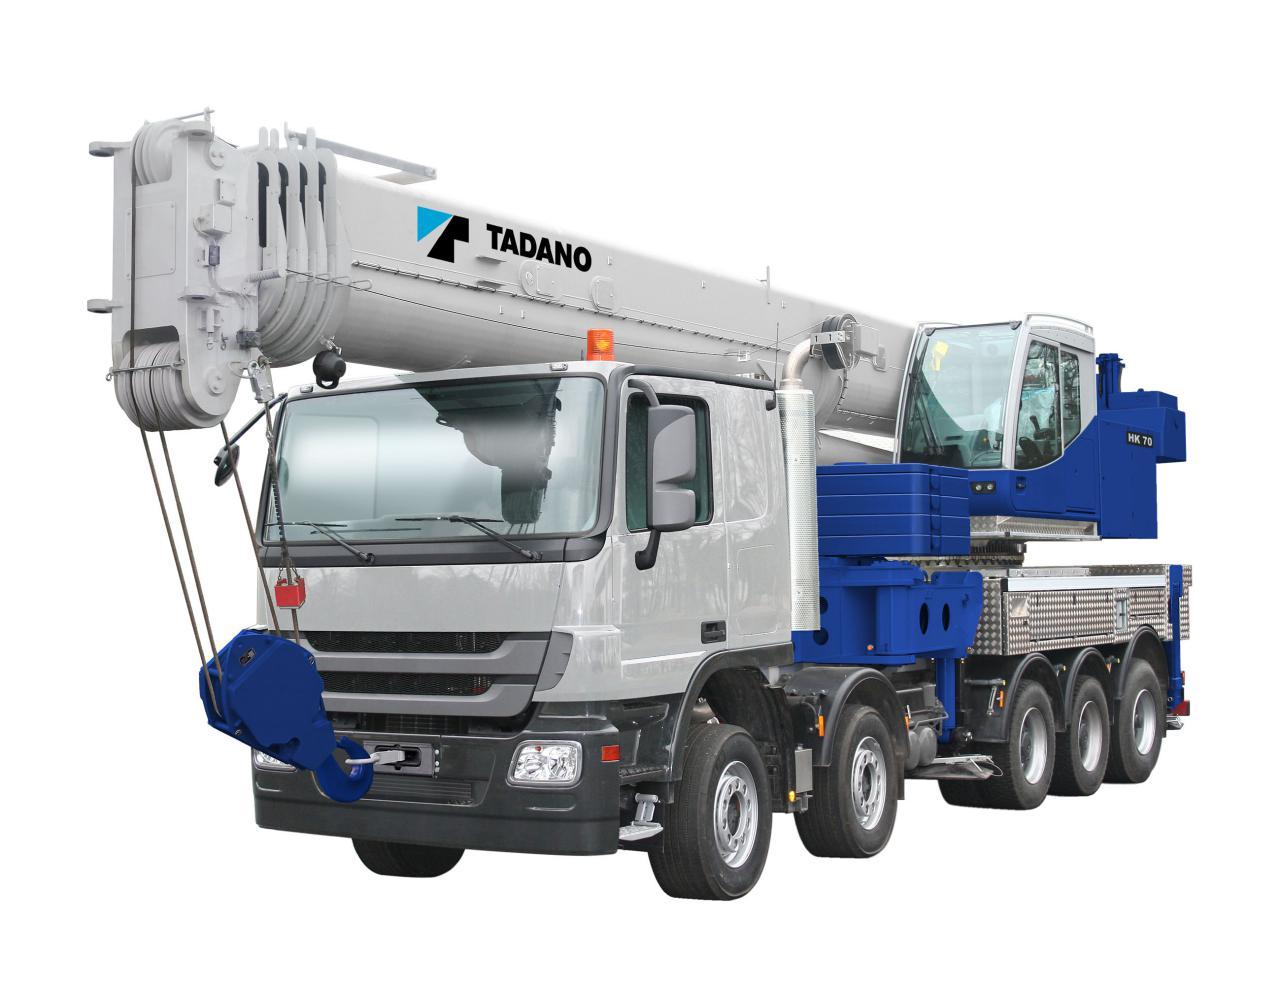 Кран Tadano HK 70 - stroyone.com